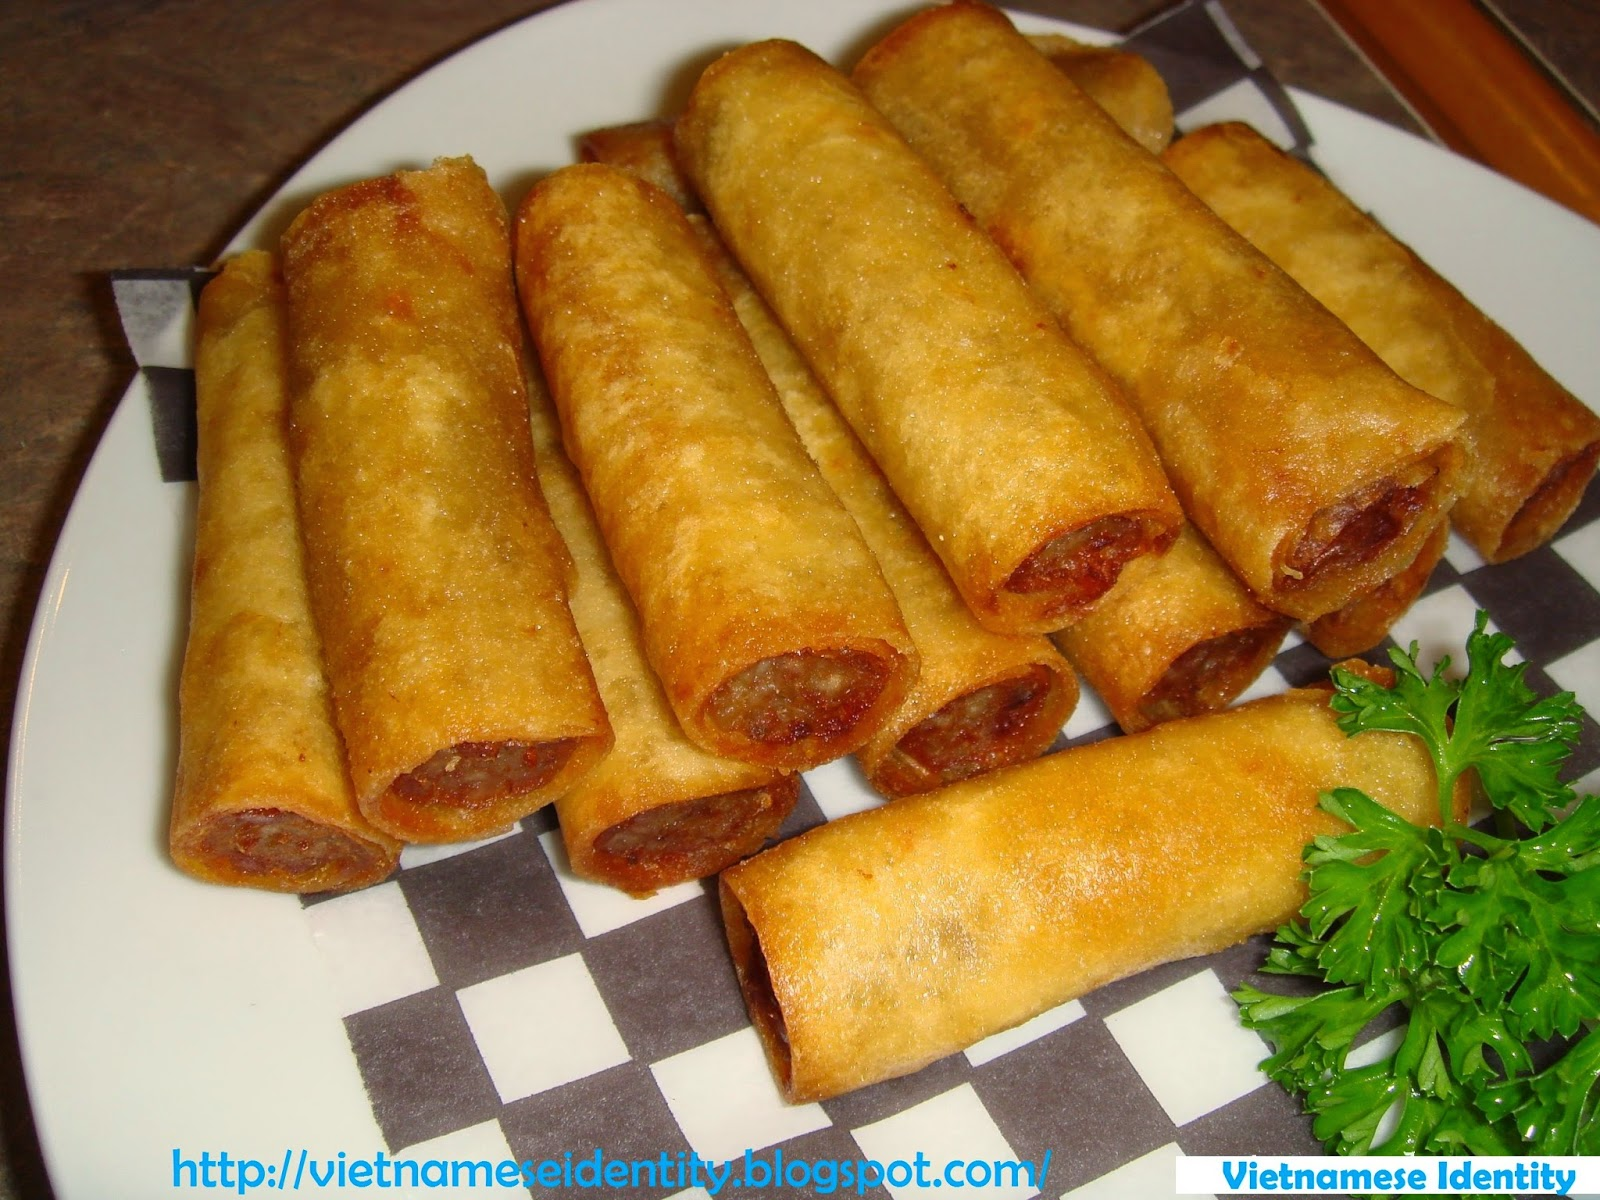 Vietnamese Identity Vietnamese fried spring rollsVietnamese Fried Spring Rolls